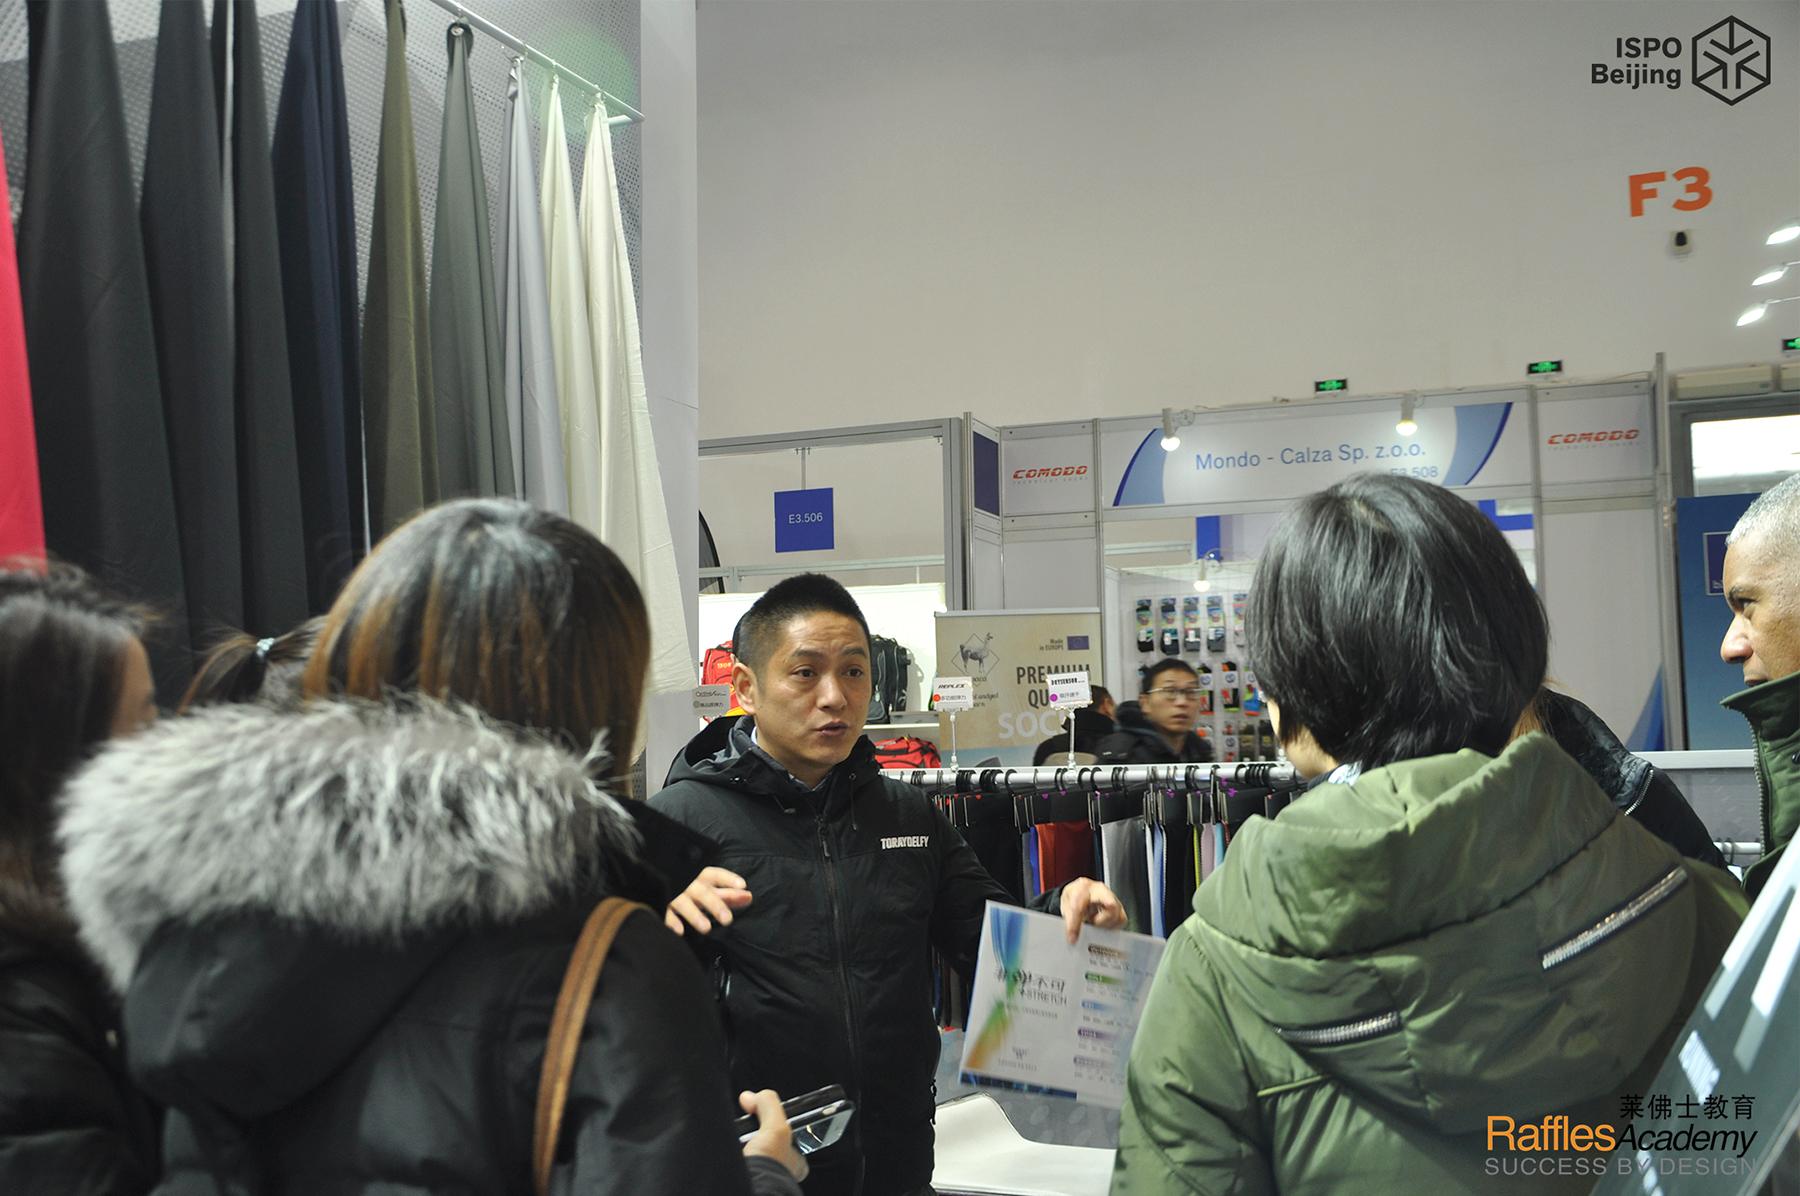 ISPO Student Day